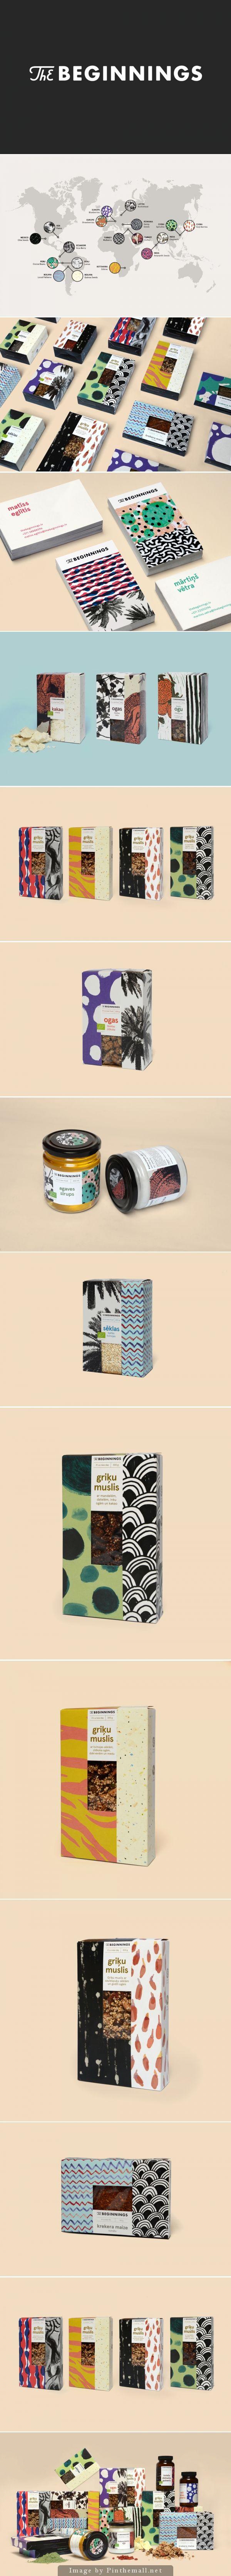 The Beginnings is interesting #identity #packaging #branding PD